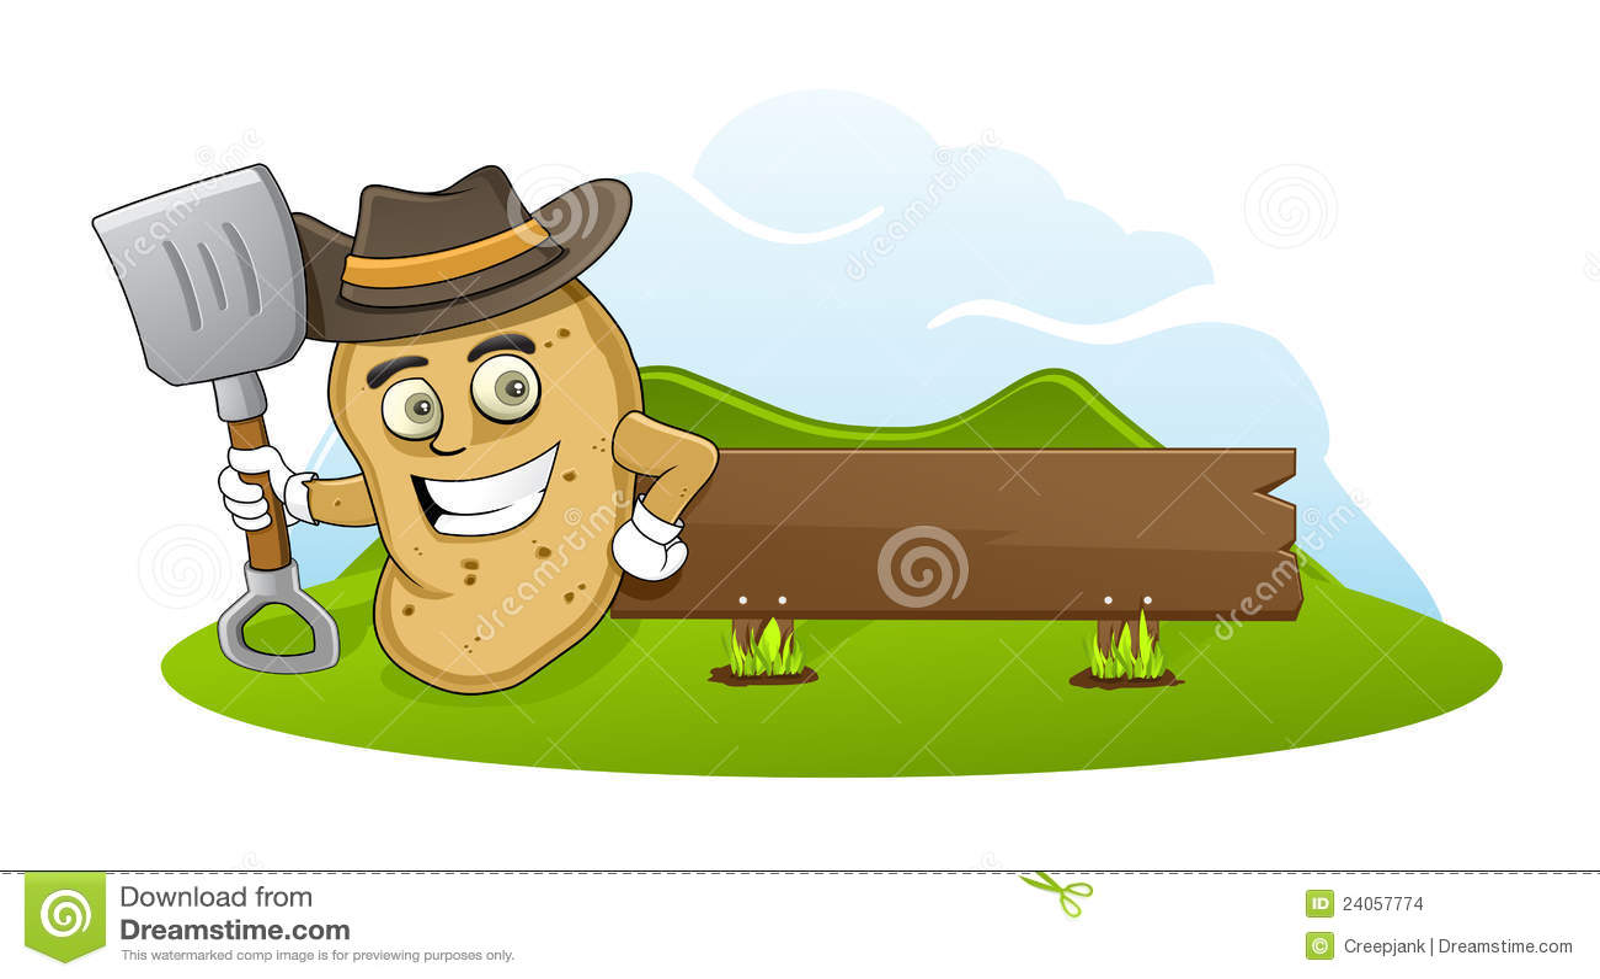 how to become a potato farmer